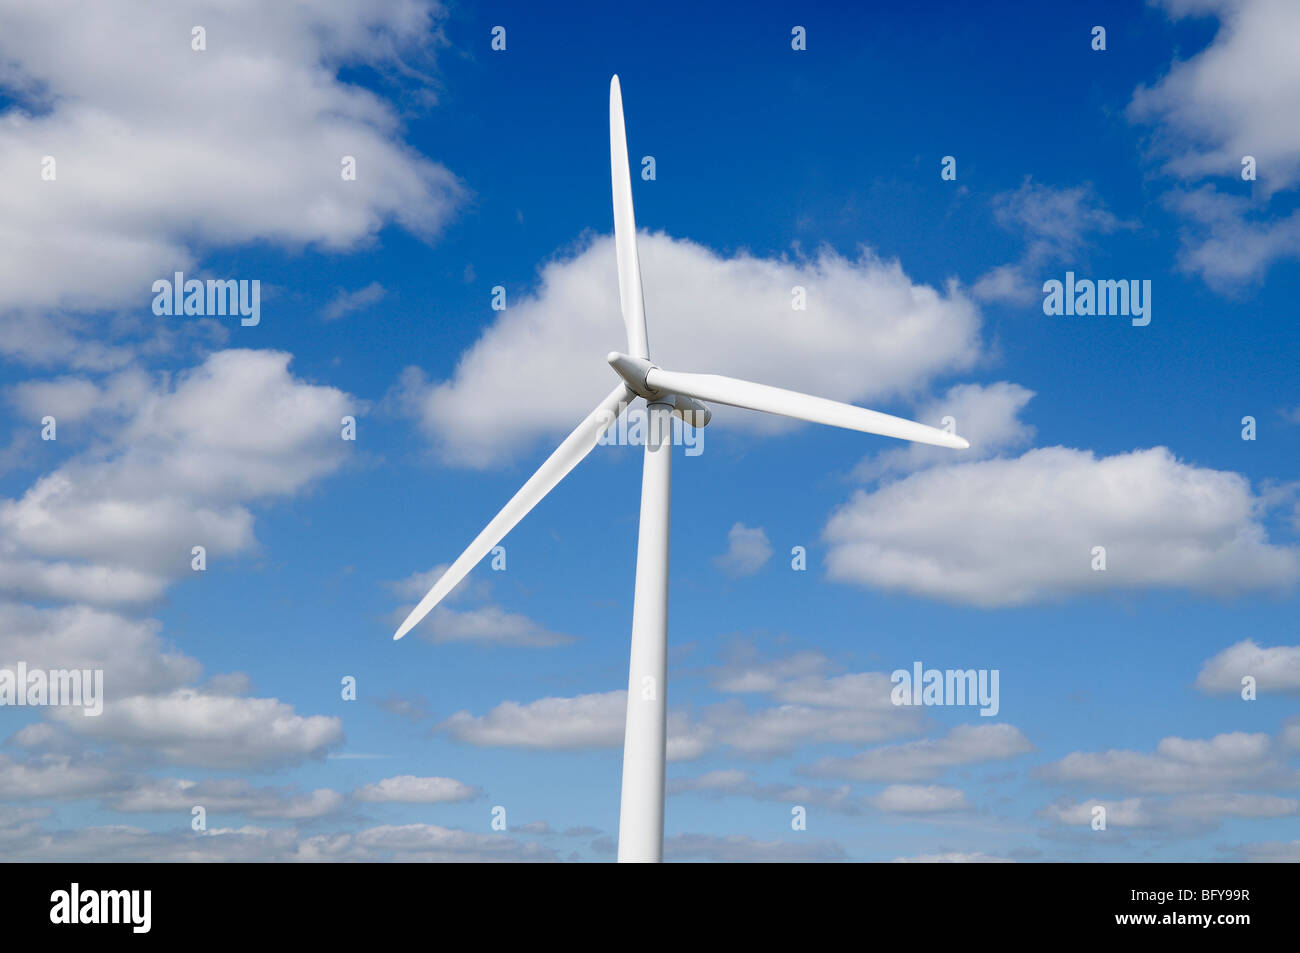 Wind turbine contre un ciel bleu rempli de nuages Photo Stock